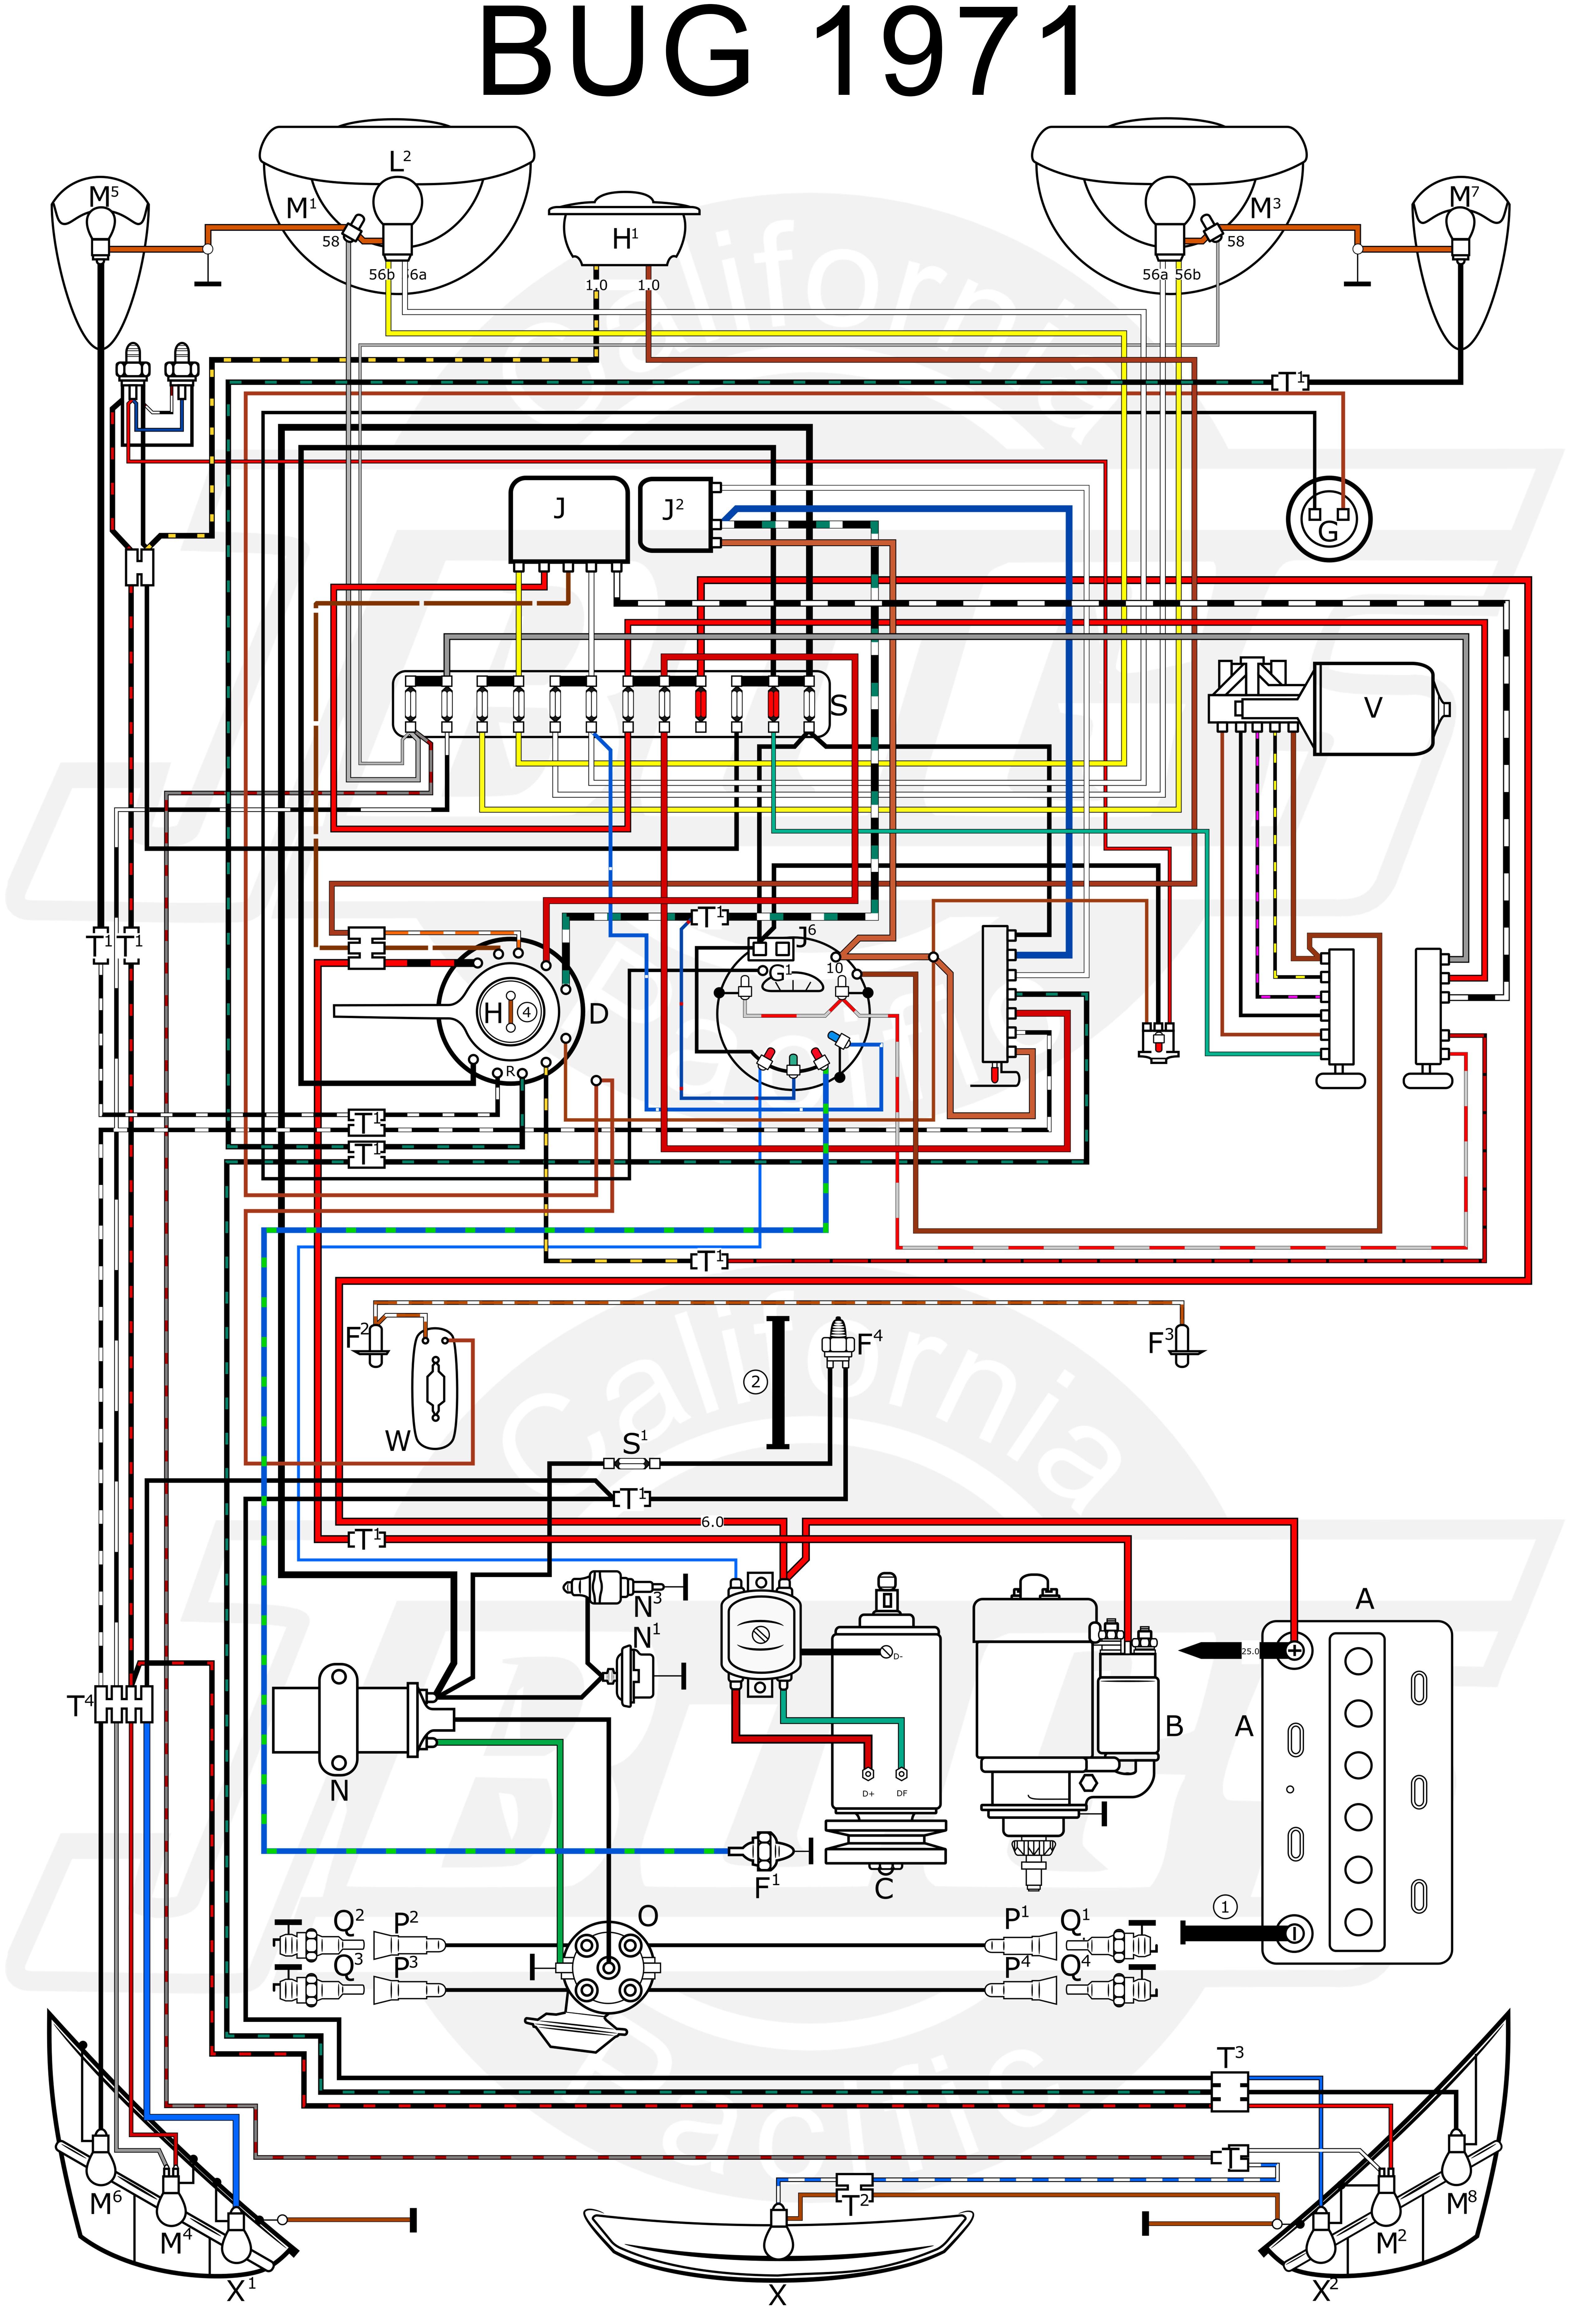 elegant 1971 vw super beetle wiring diagram wiring diagram image rh mainetreasurechest com